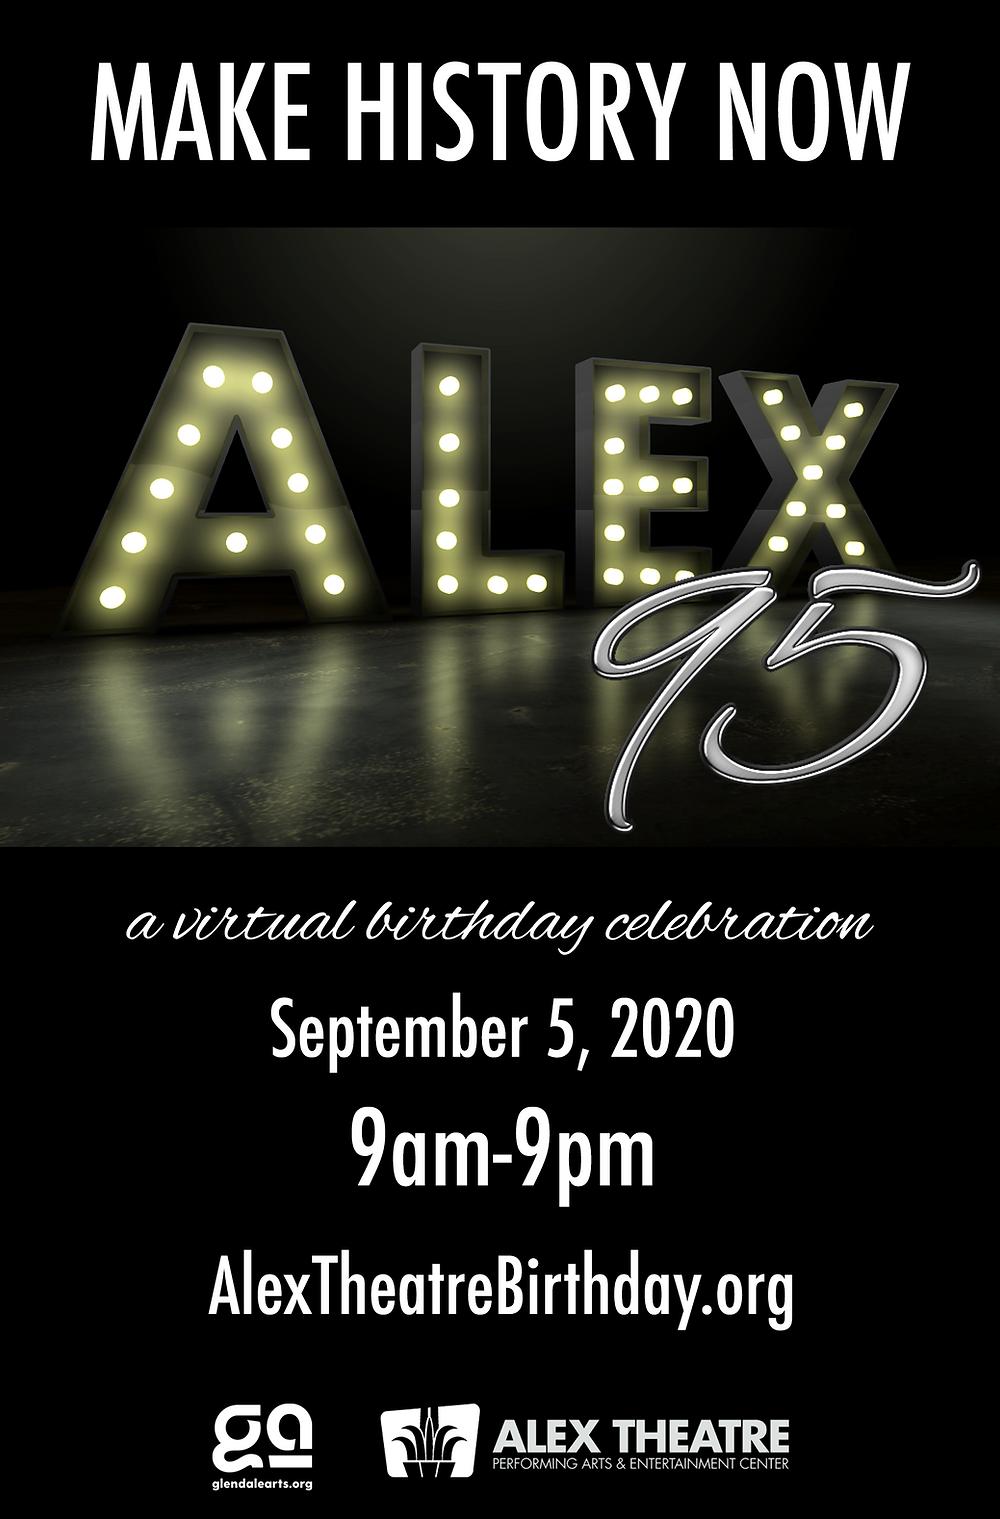 Flyer: Make History Now; Alex95 a virtual celebration September 5, 2020 from 9am-9pm AlexTheatreBirthday.org